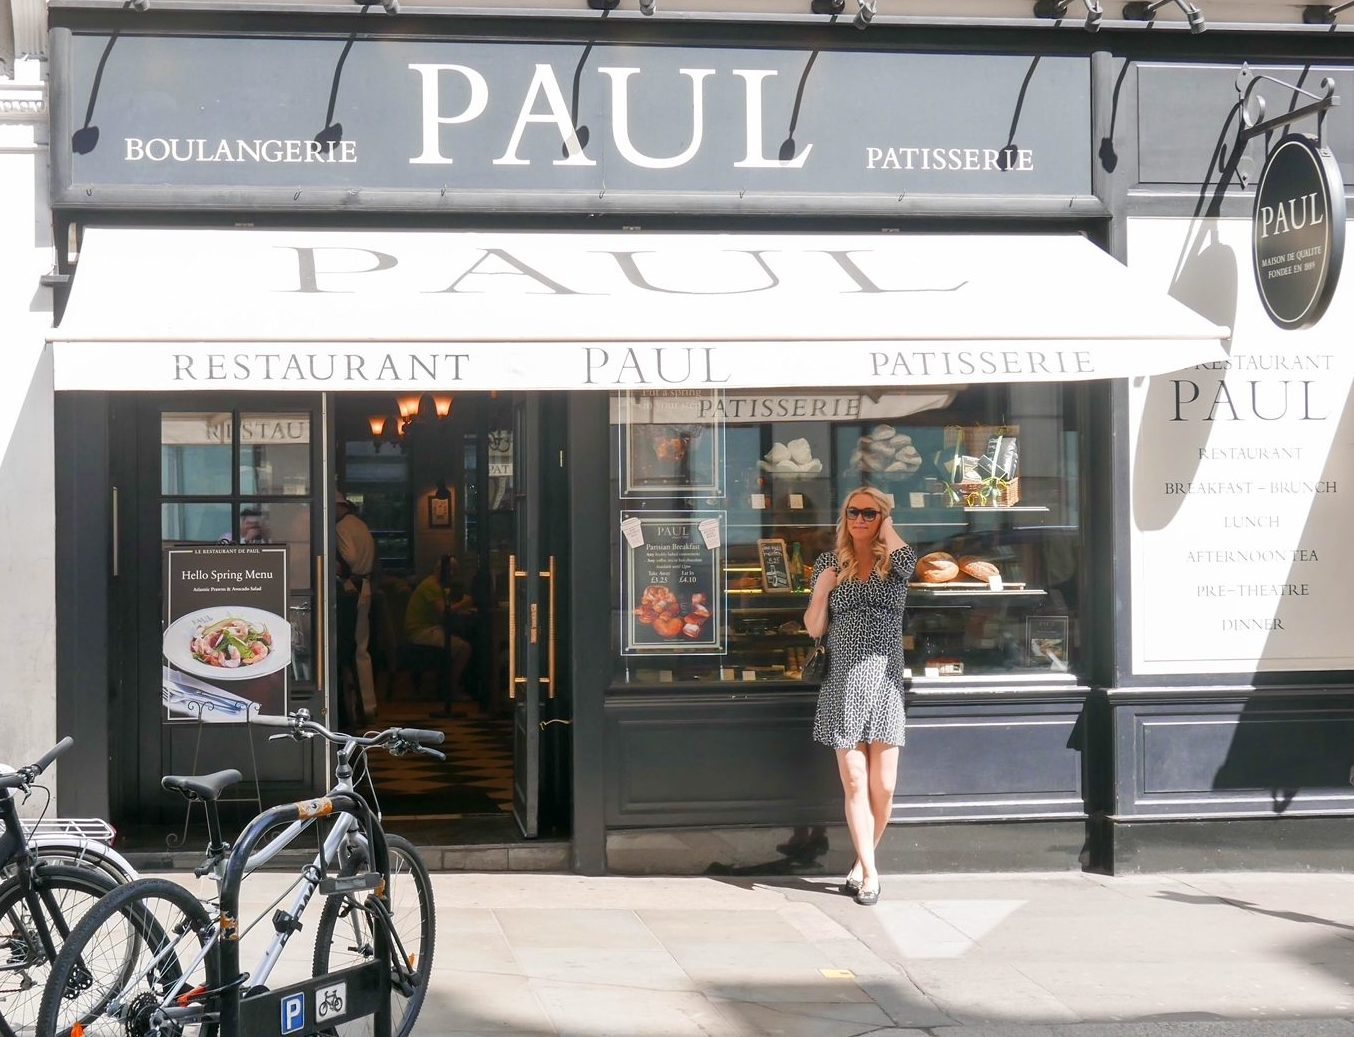 Le Restaurant de Paul – A taste of France in Covent Garden